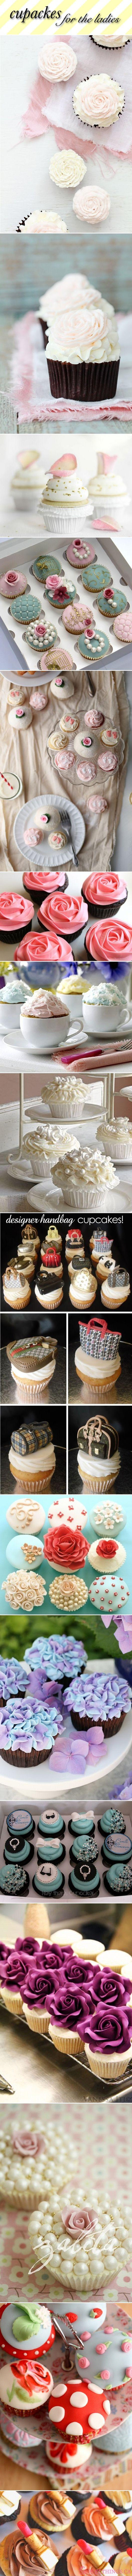 lots of darling cupcakes